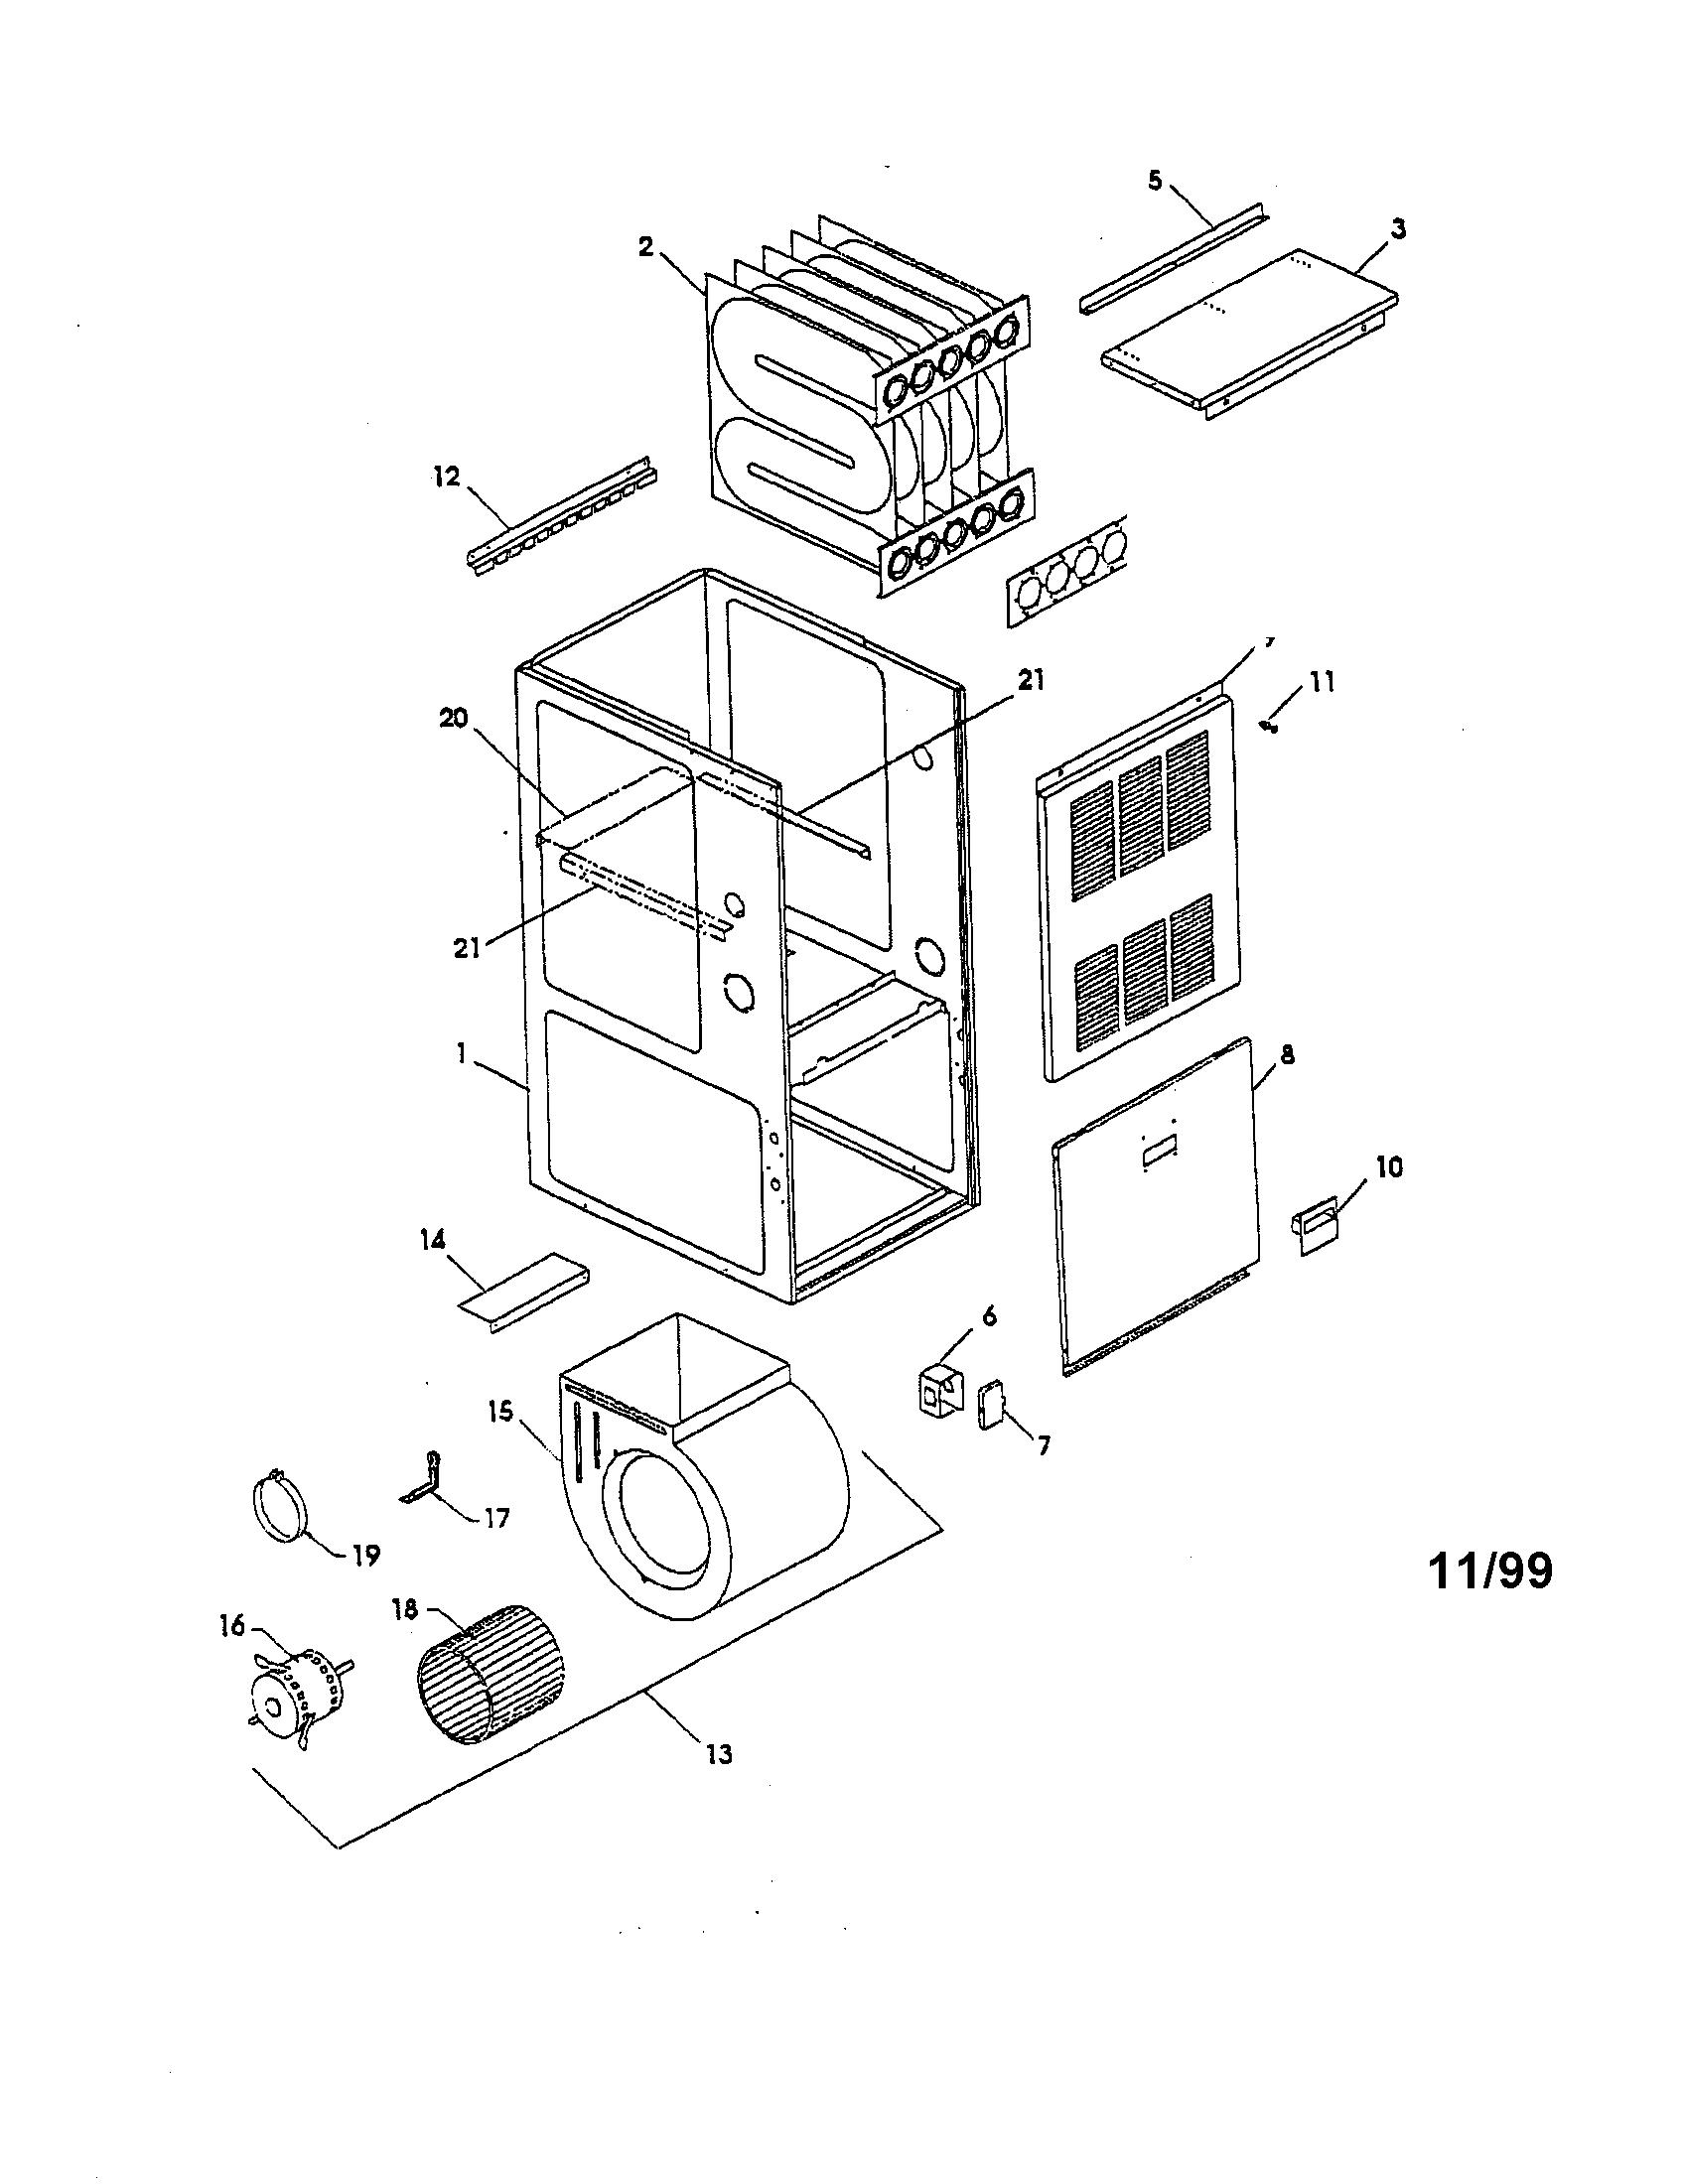 hight resolution of goodman gmn120 5 heat exchanger diagram